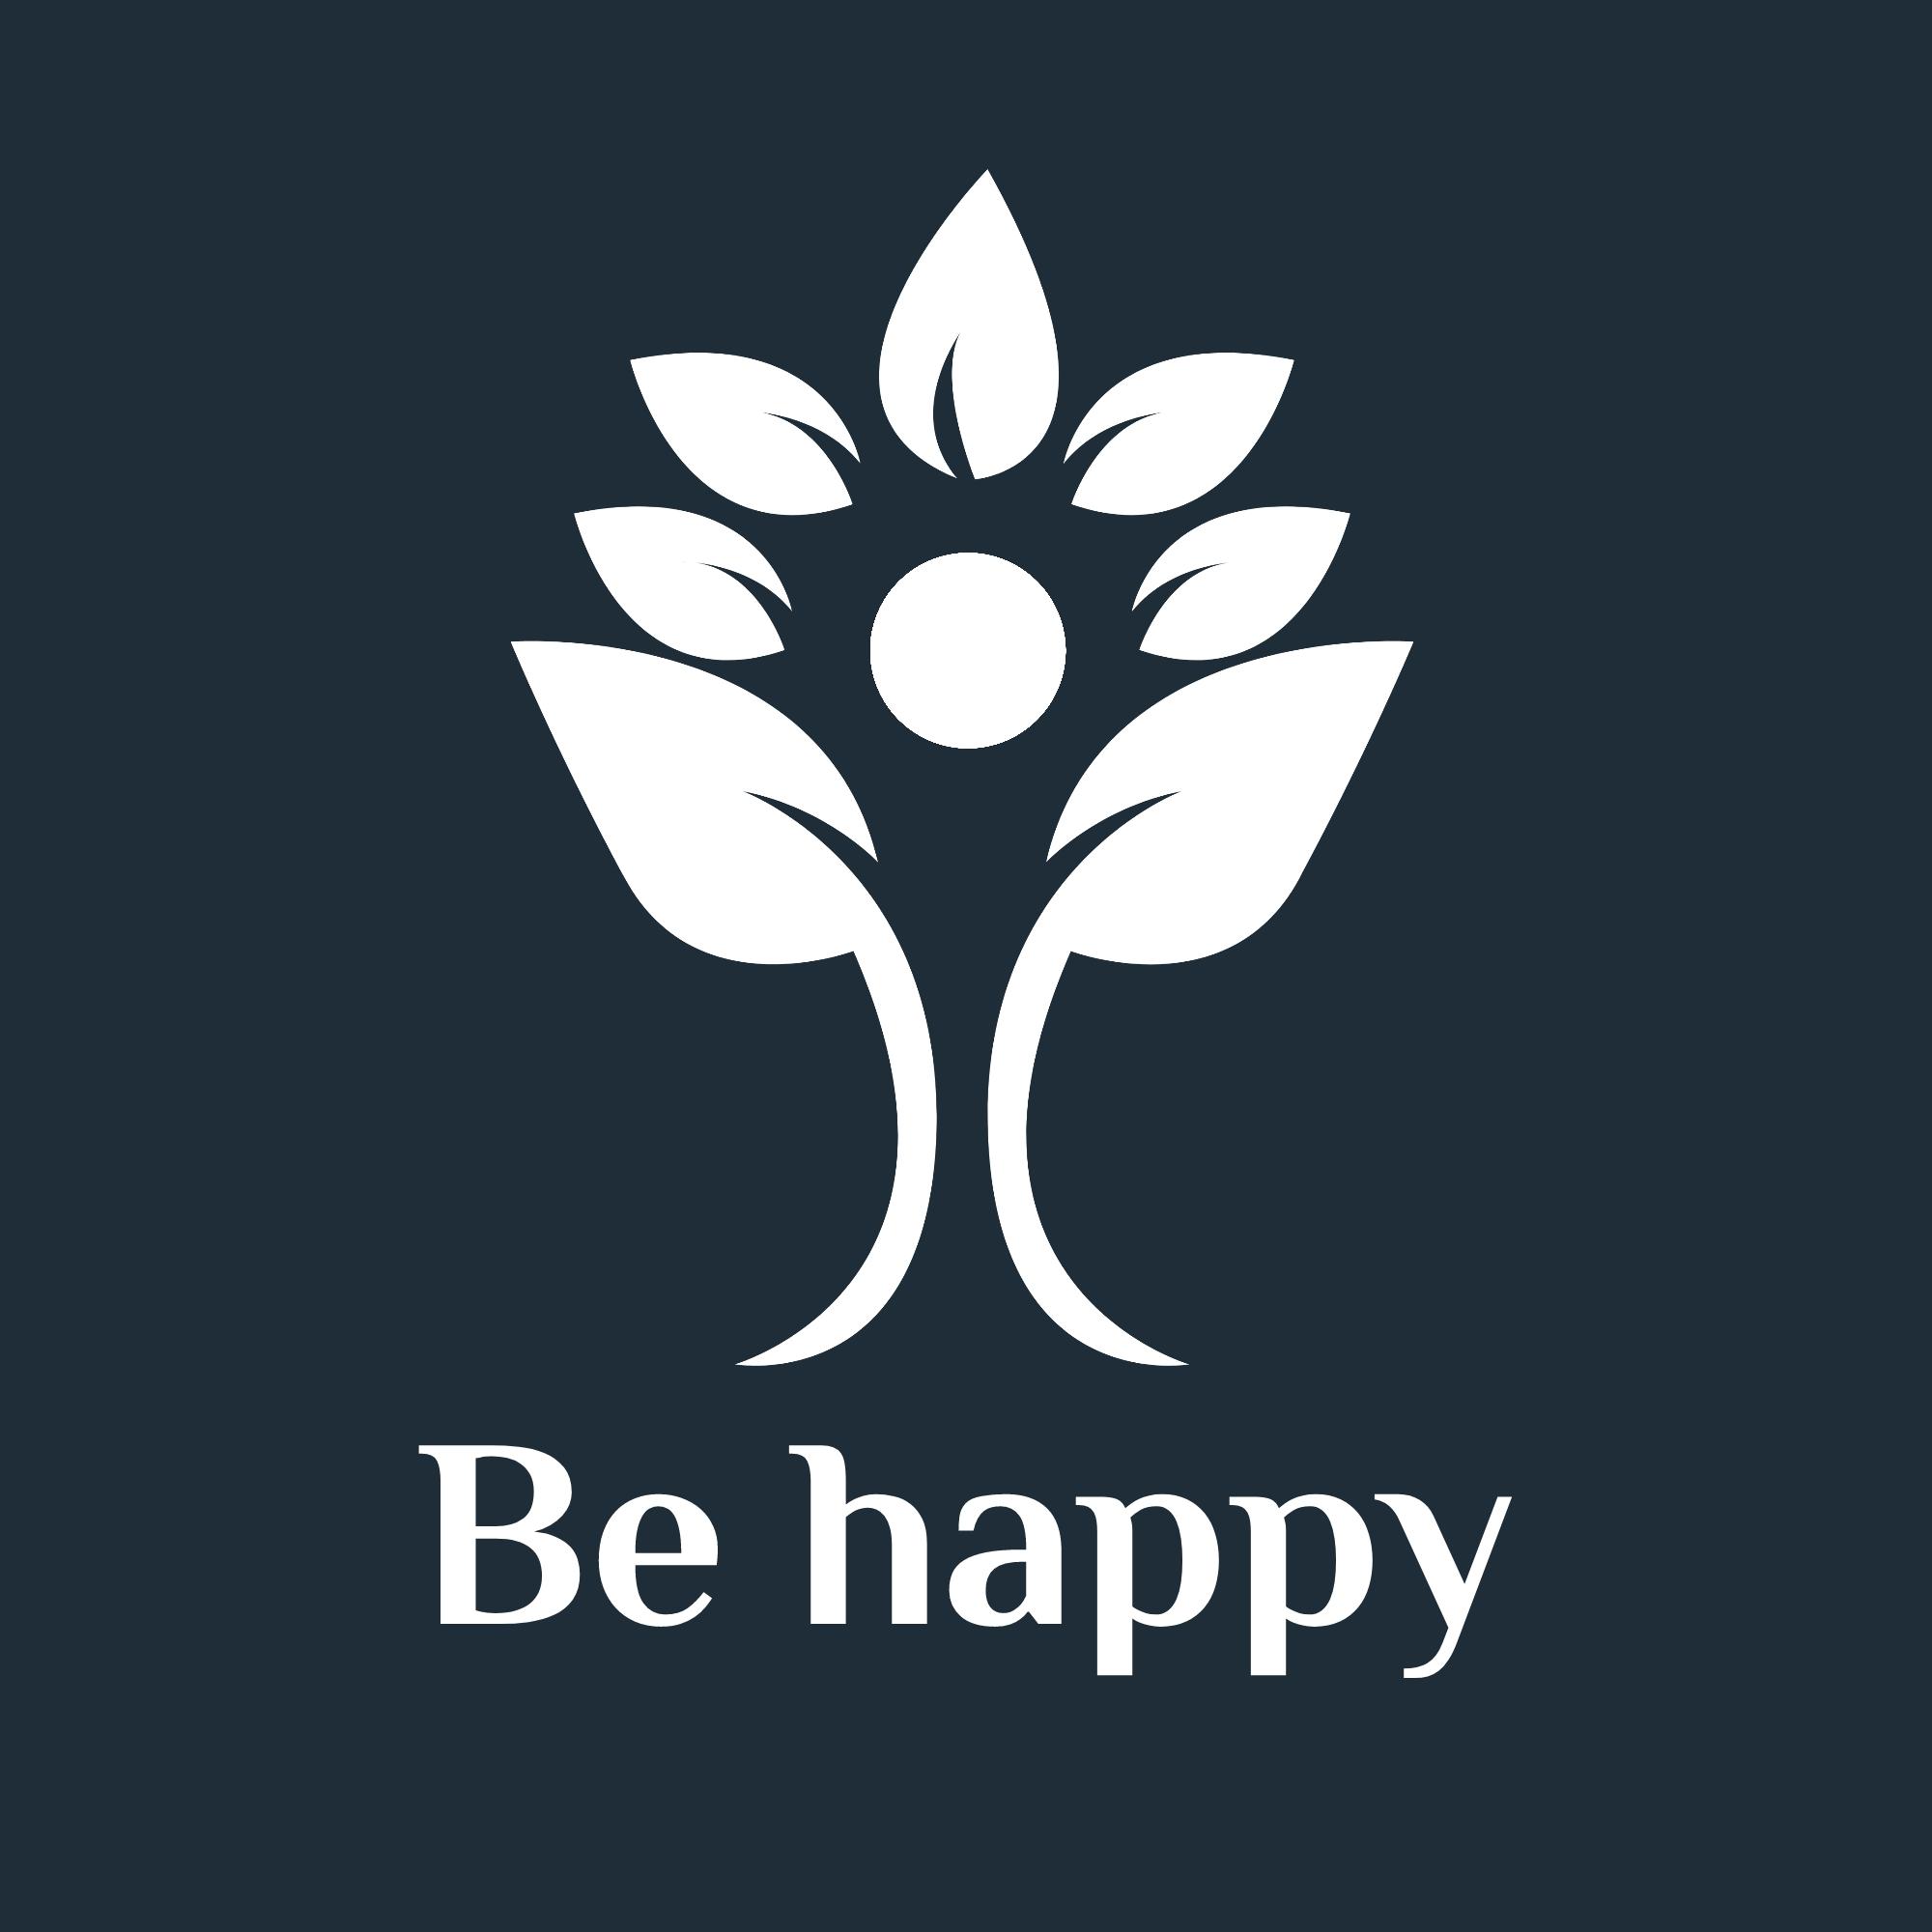 كن سعيدا Be happy